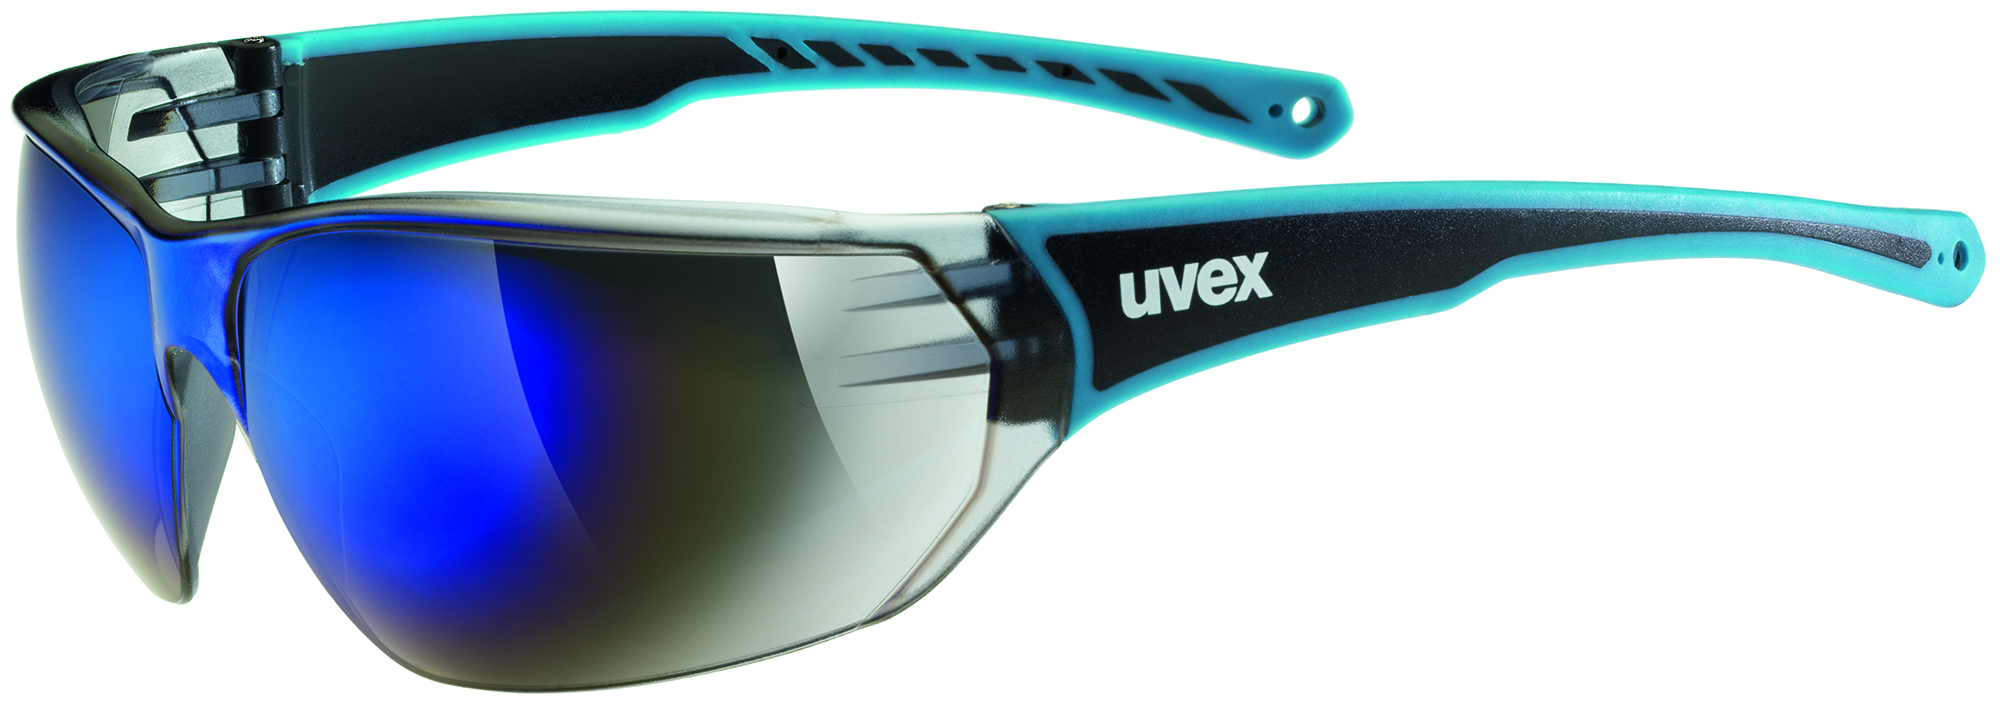 Uvex Солнцезащитные очки Uvex 204